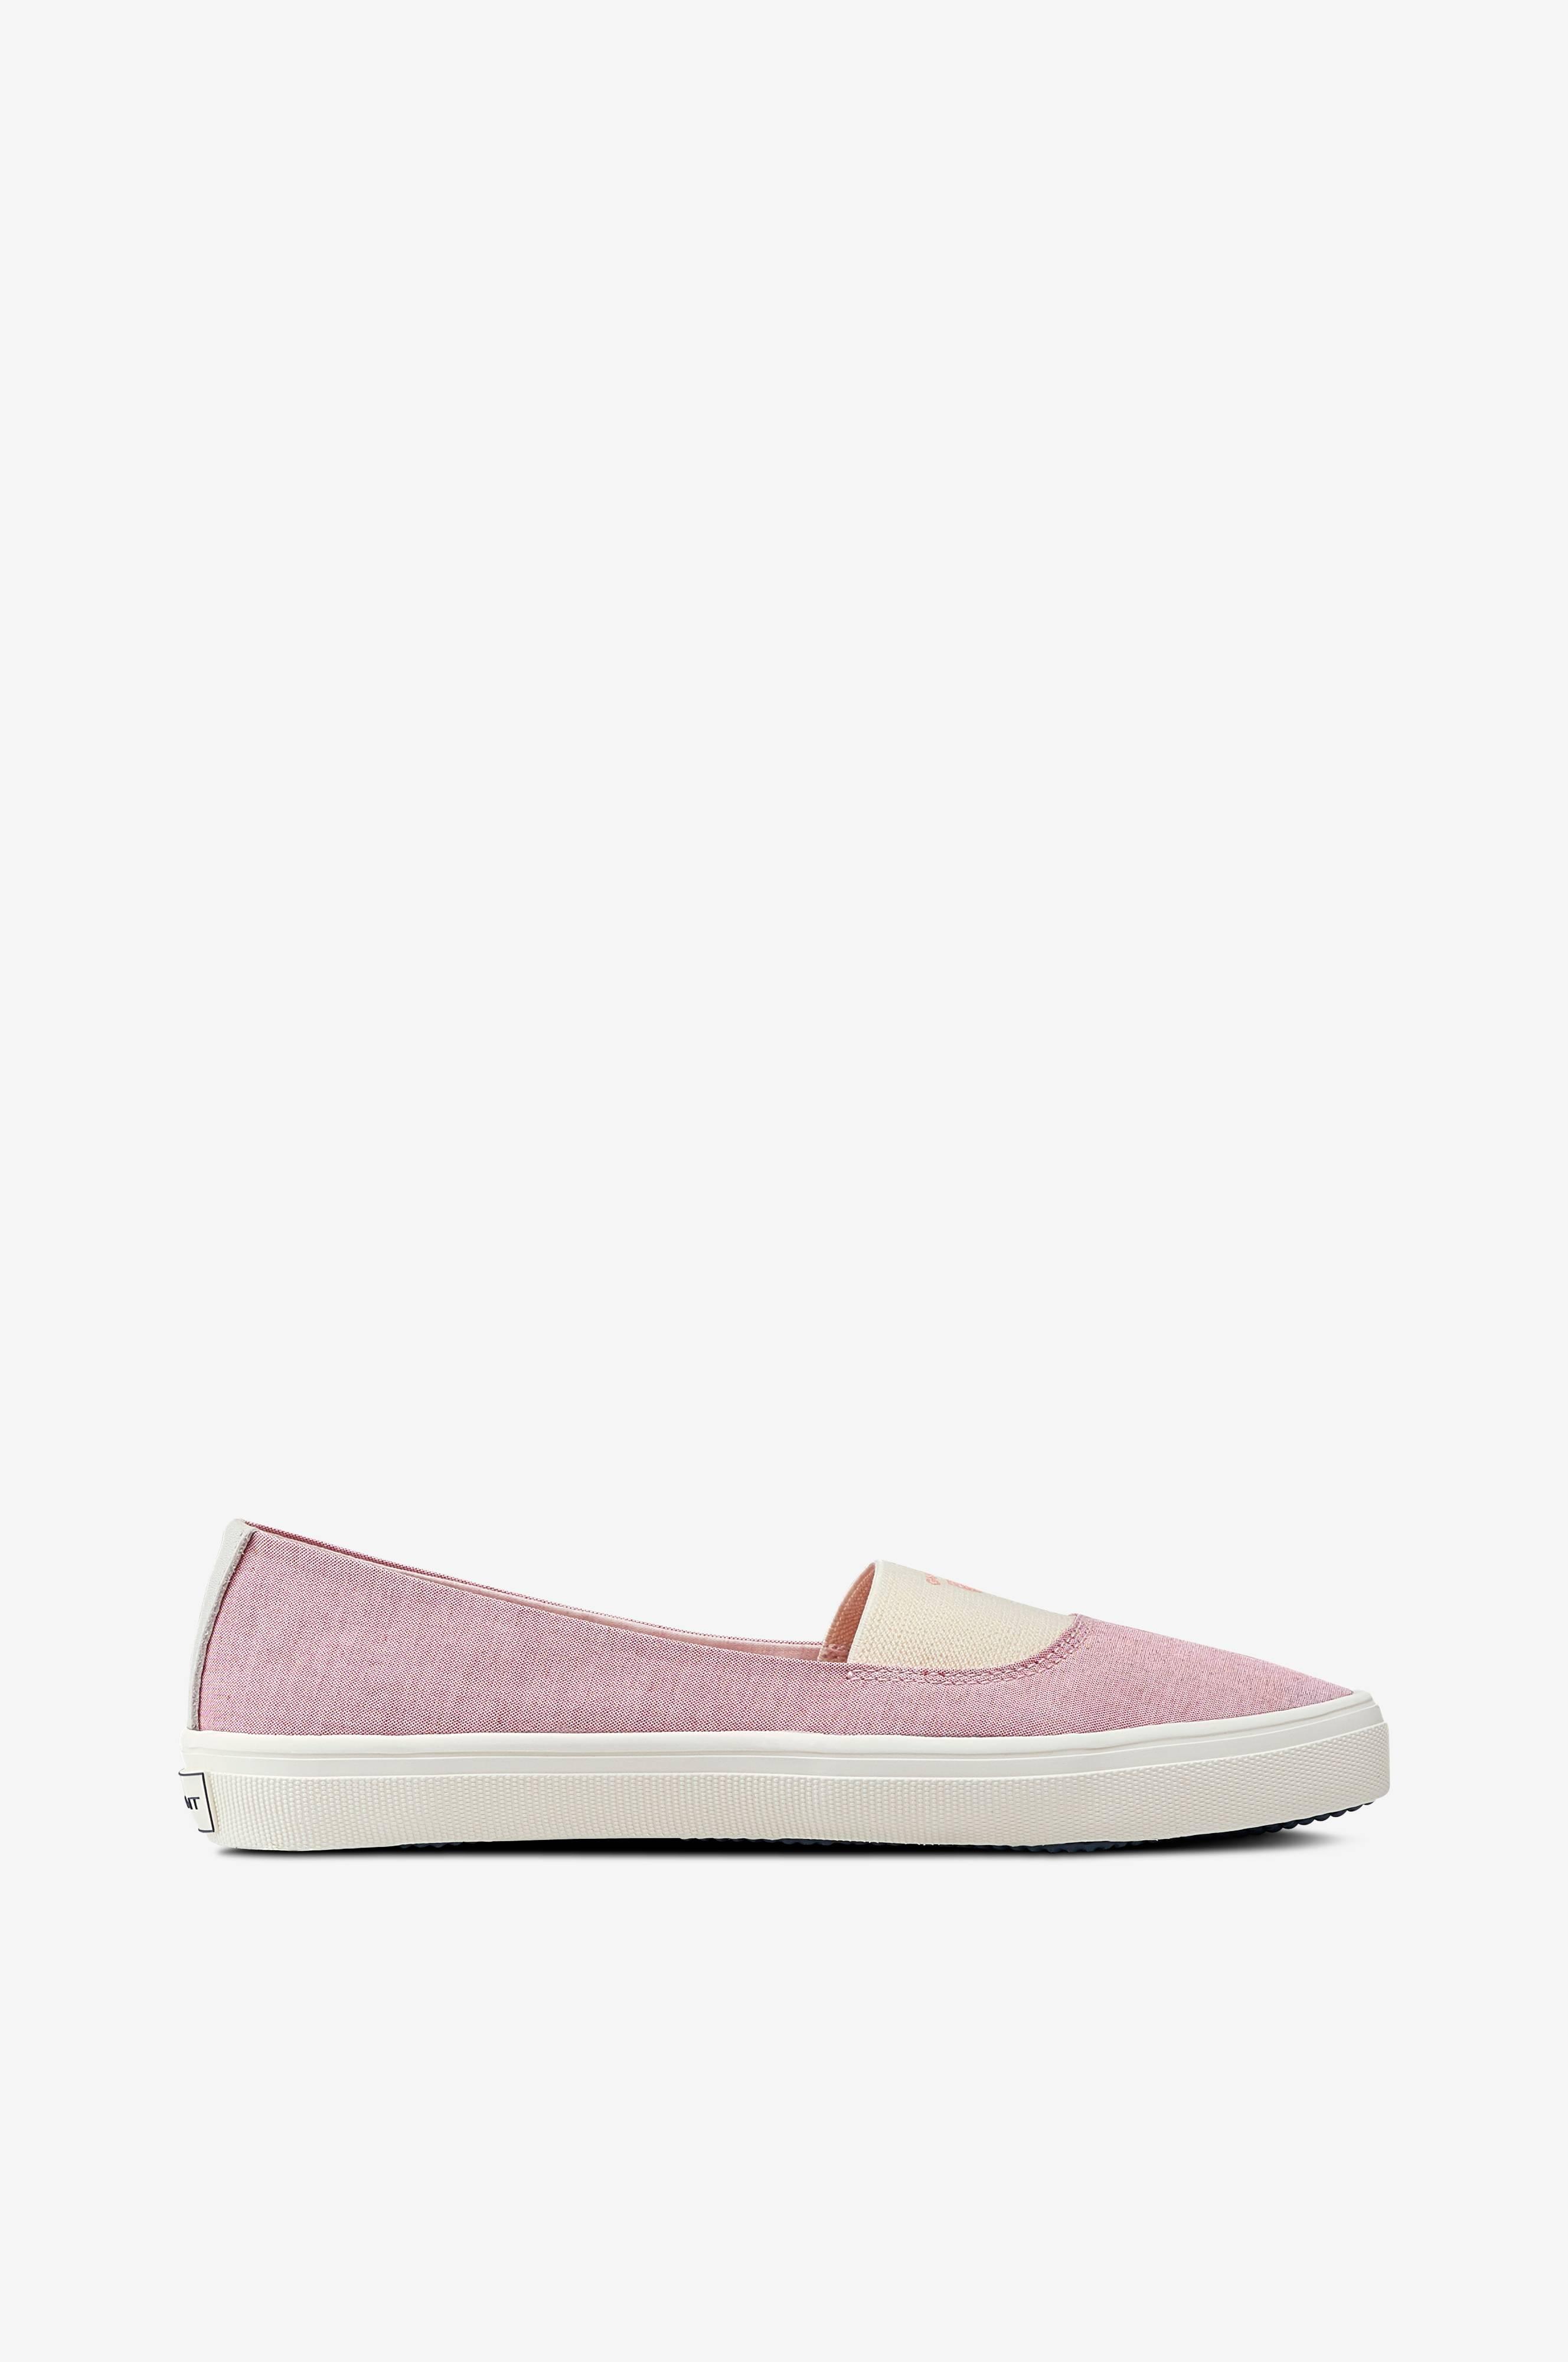 cef562aaafe Gant Sko New Haven Slip-on Shoes - Rosa - Dame - Ellos.no